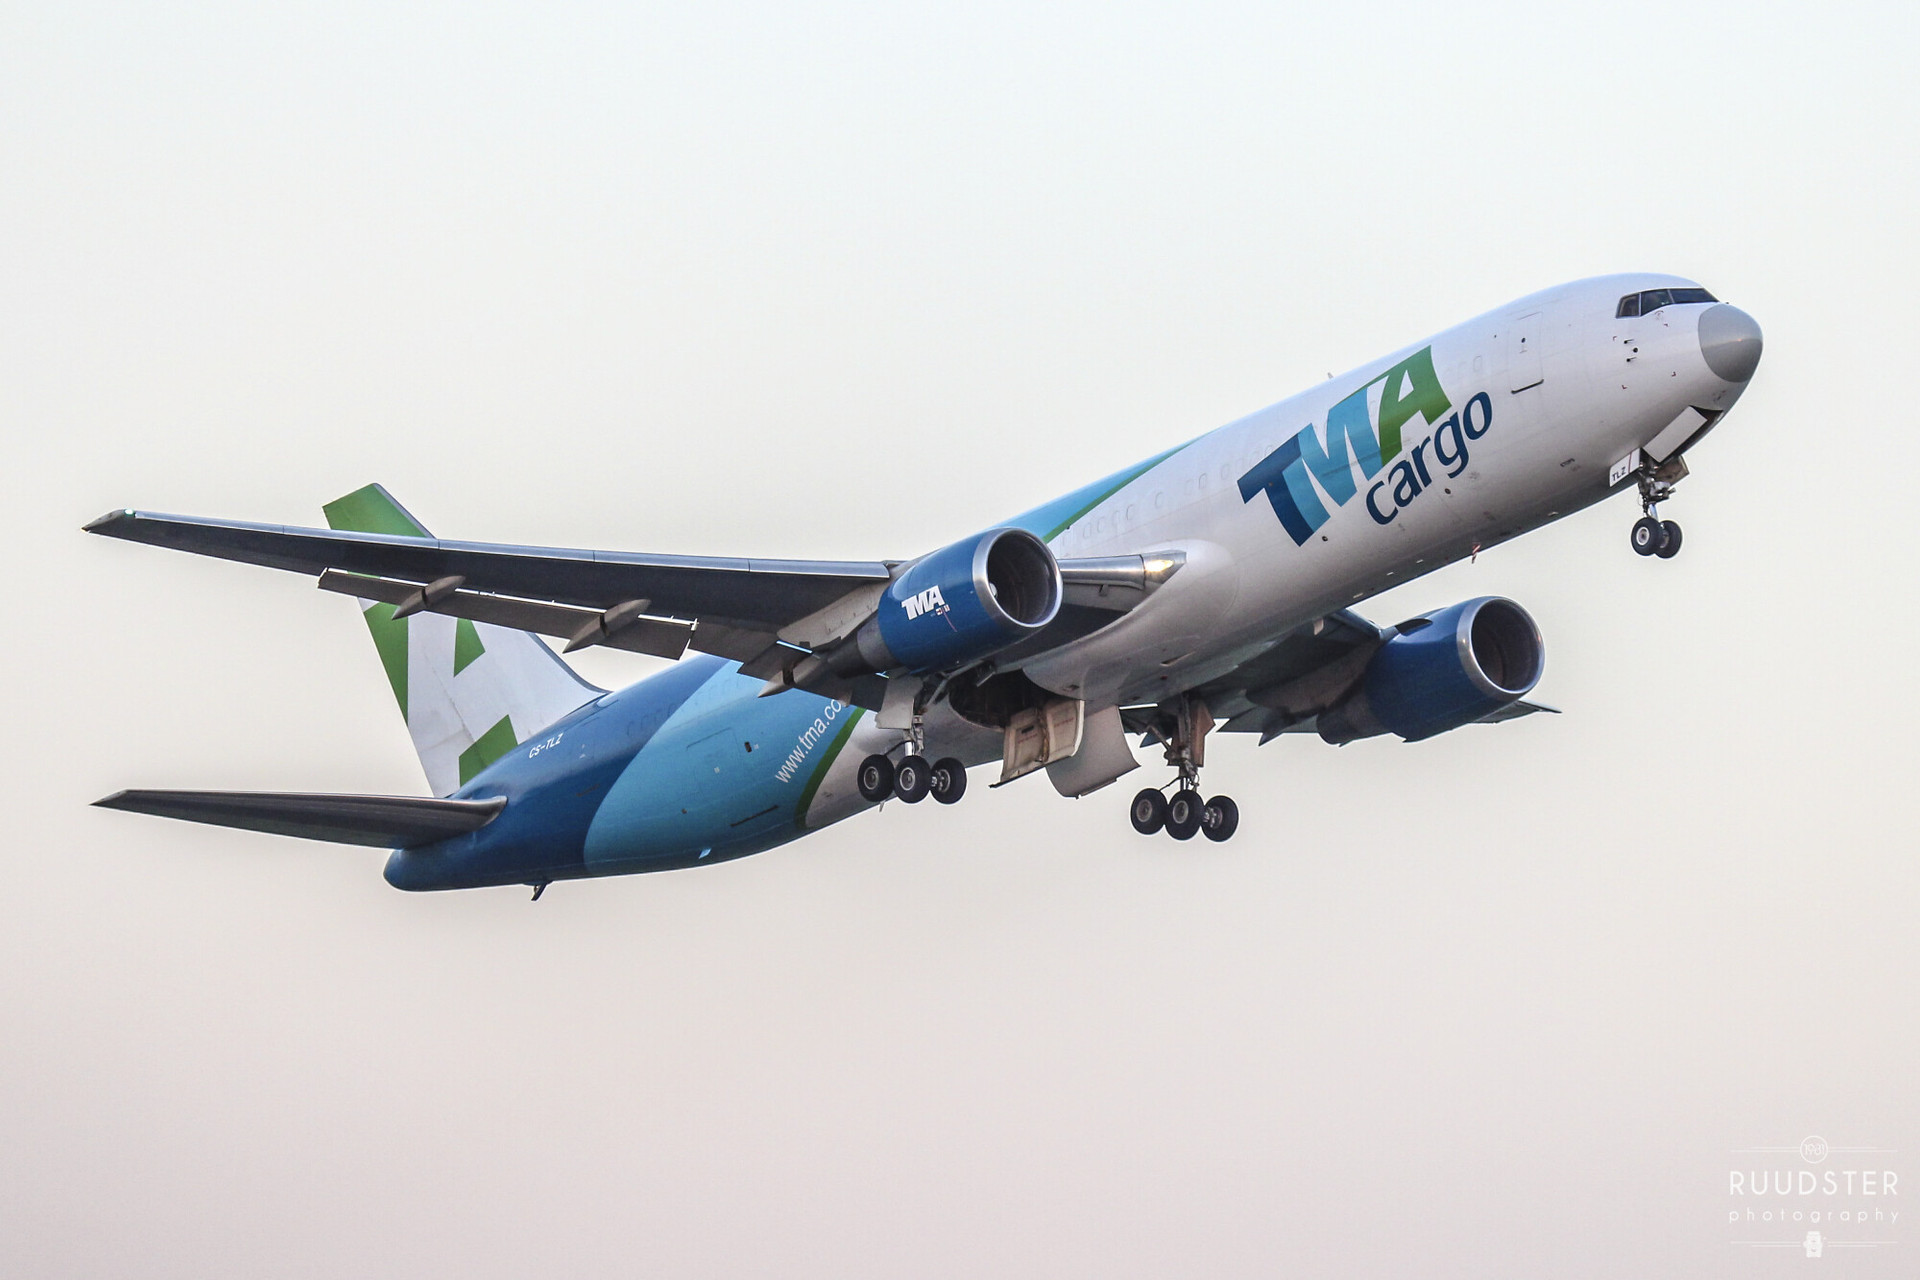 CS-TLZ | Build: 1988 - Boeing 767-375ERBDSF